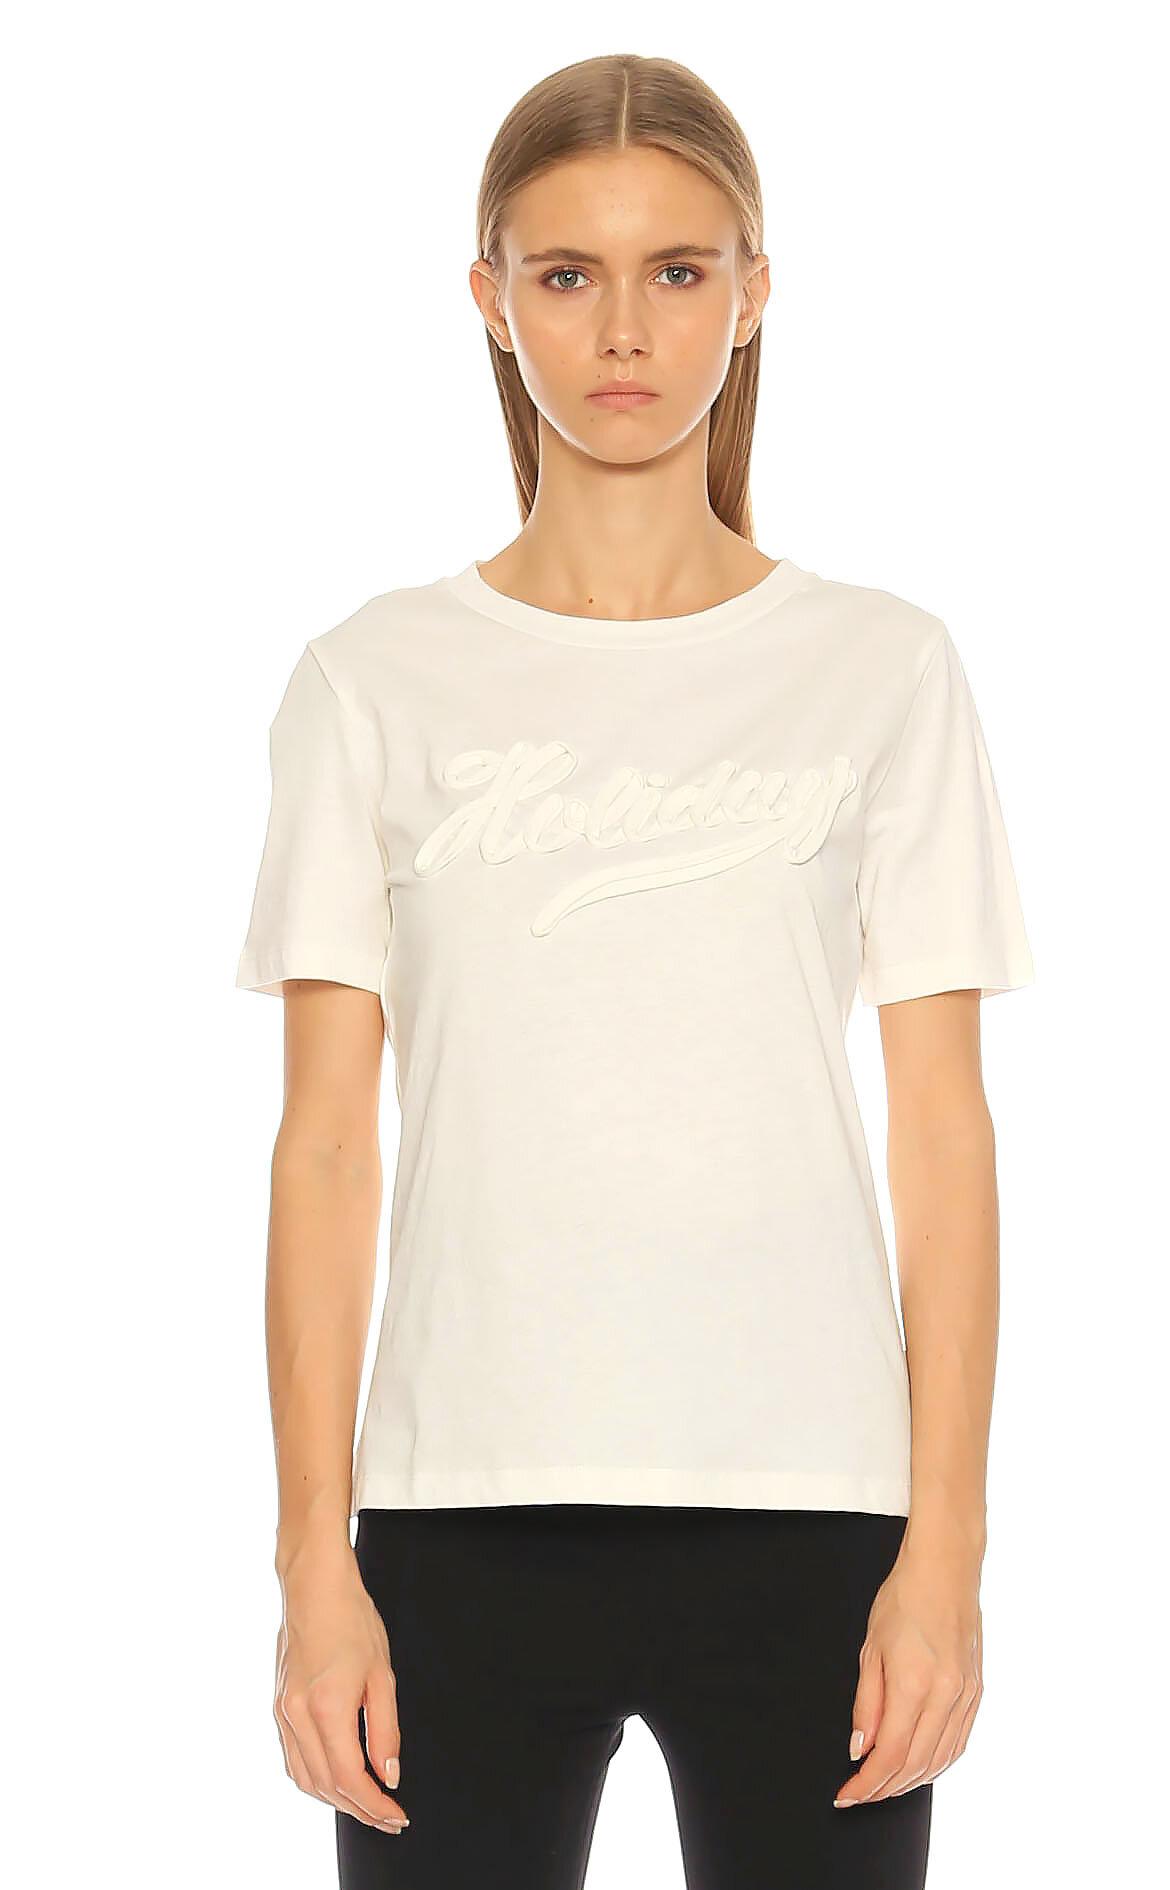 Boutique Kabartma Desenli Beyaz Moschino T-Shirt